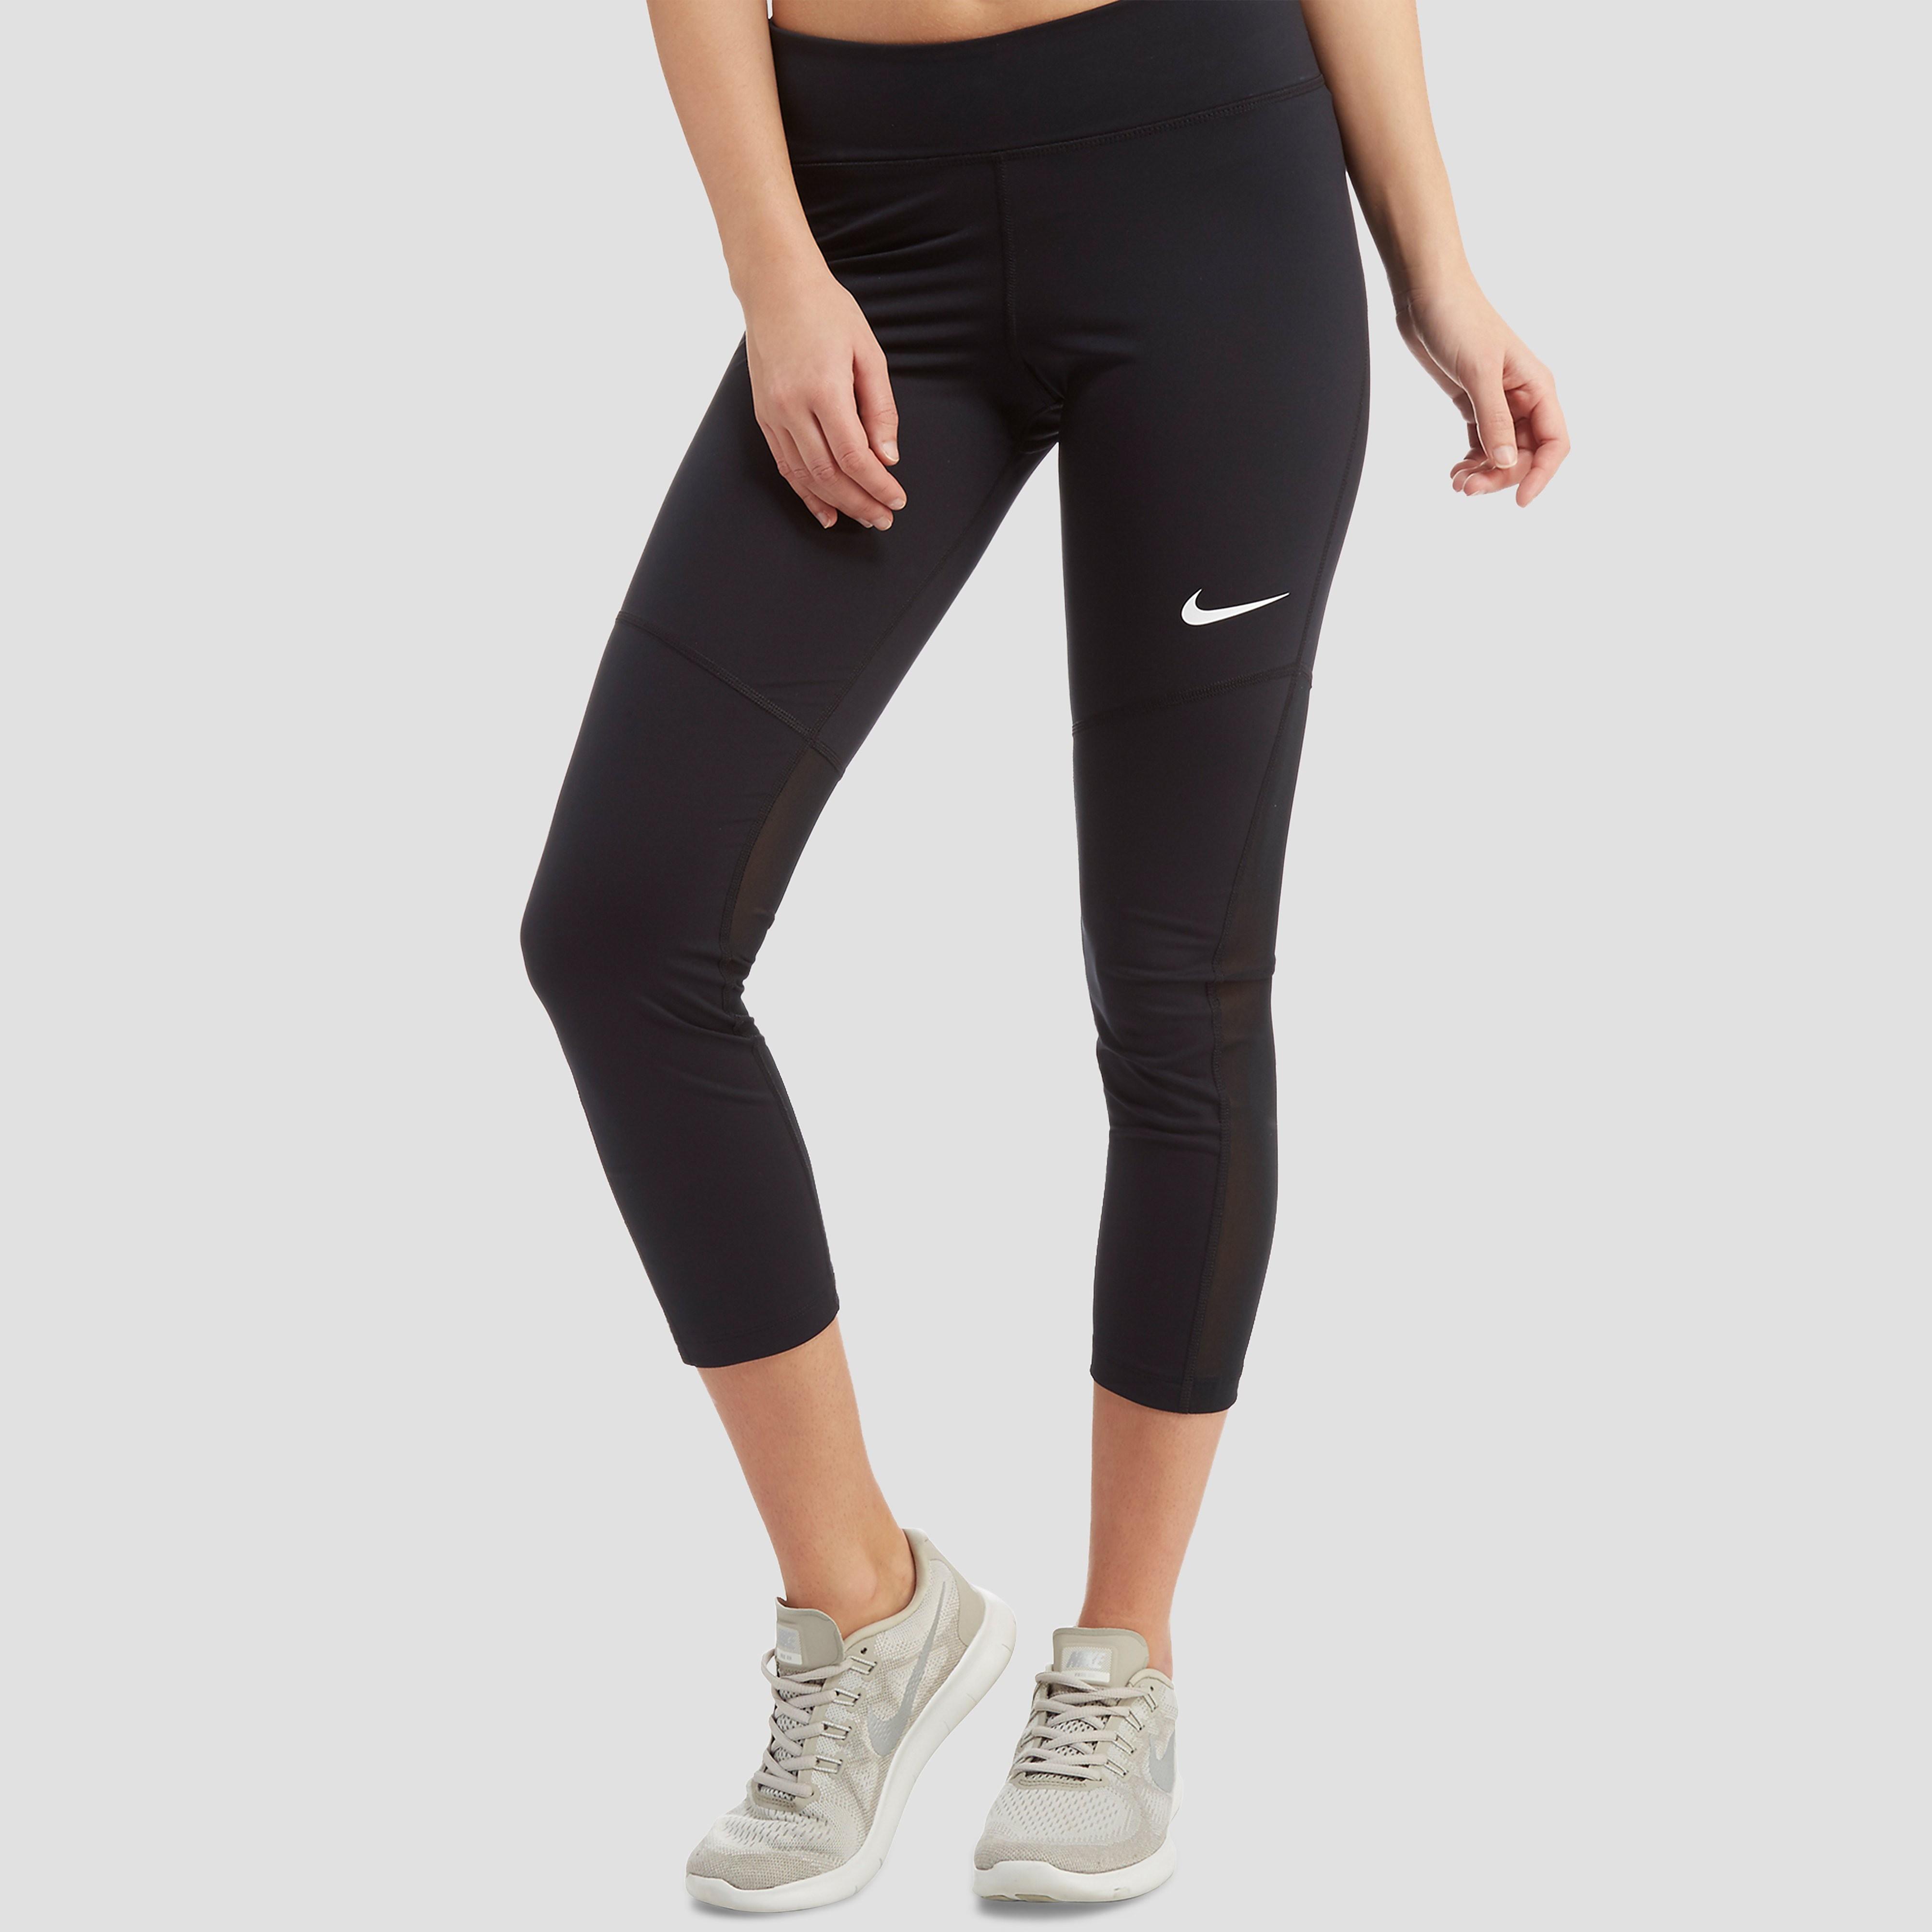 Nike Power Fly Crop Women's Tights